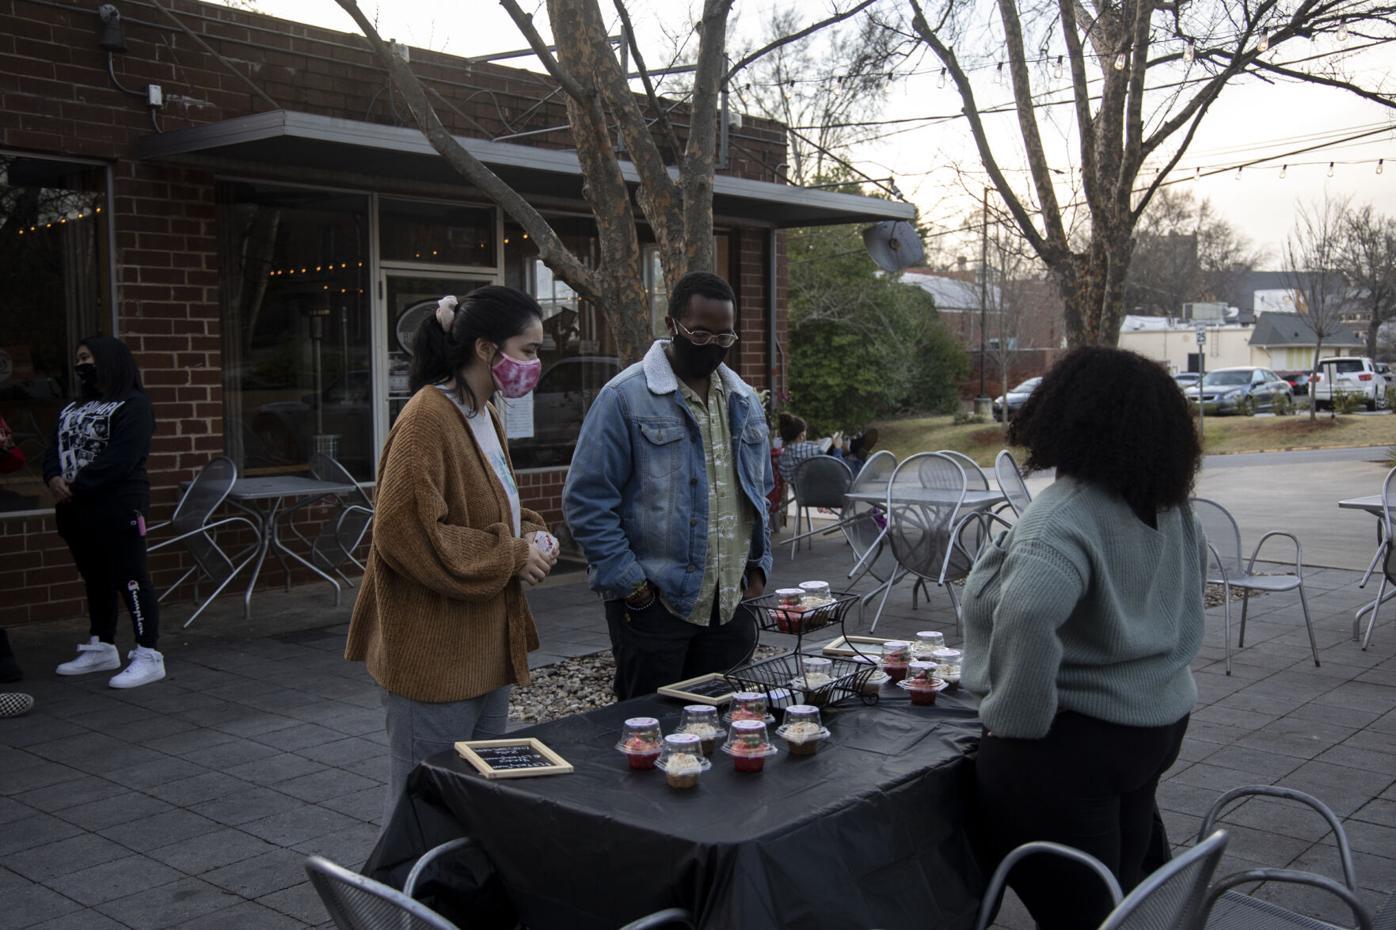 PHOTOS: Athens' Black entrepreneurs, artists gather for market event